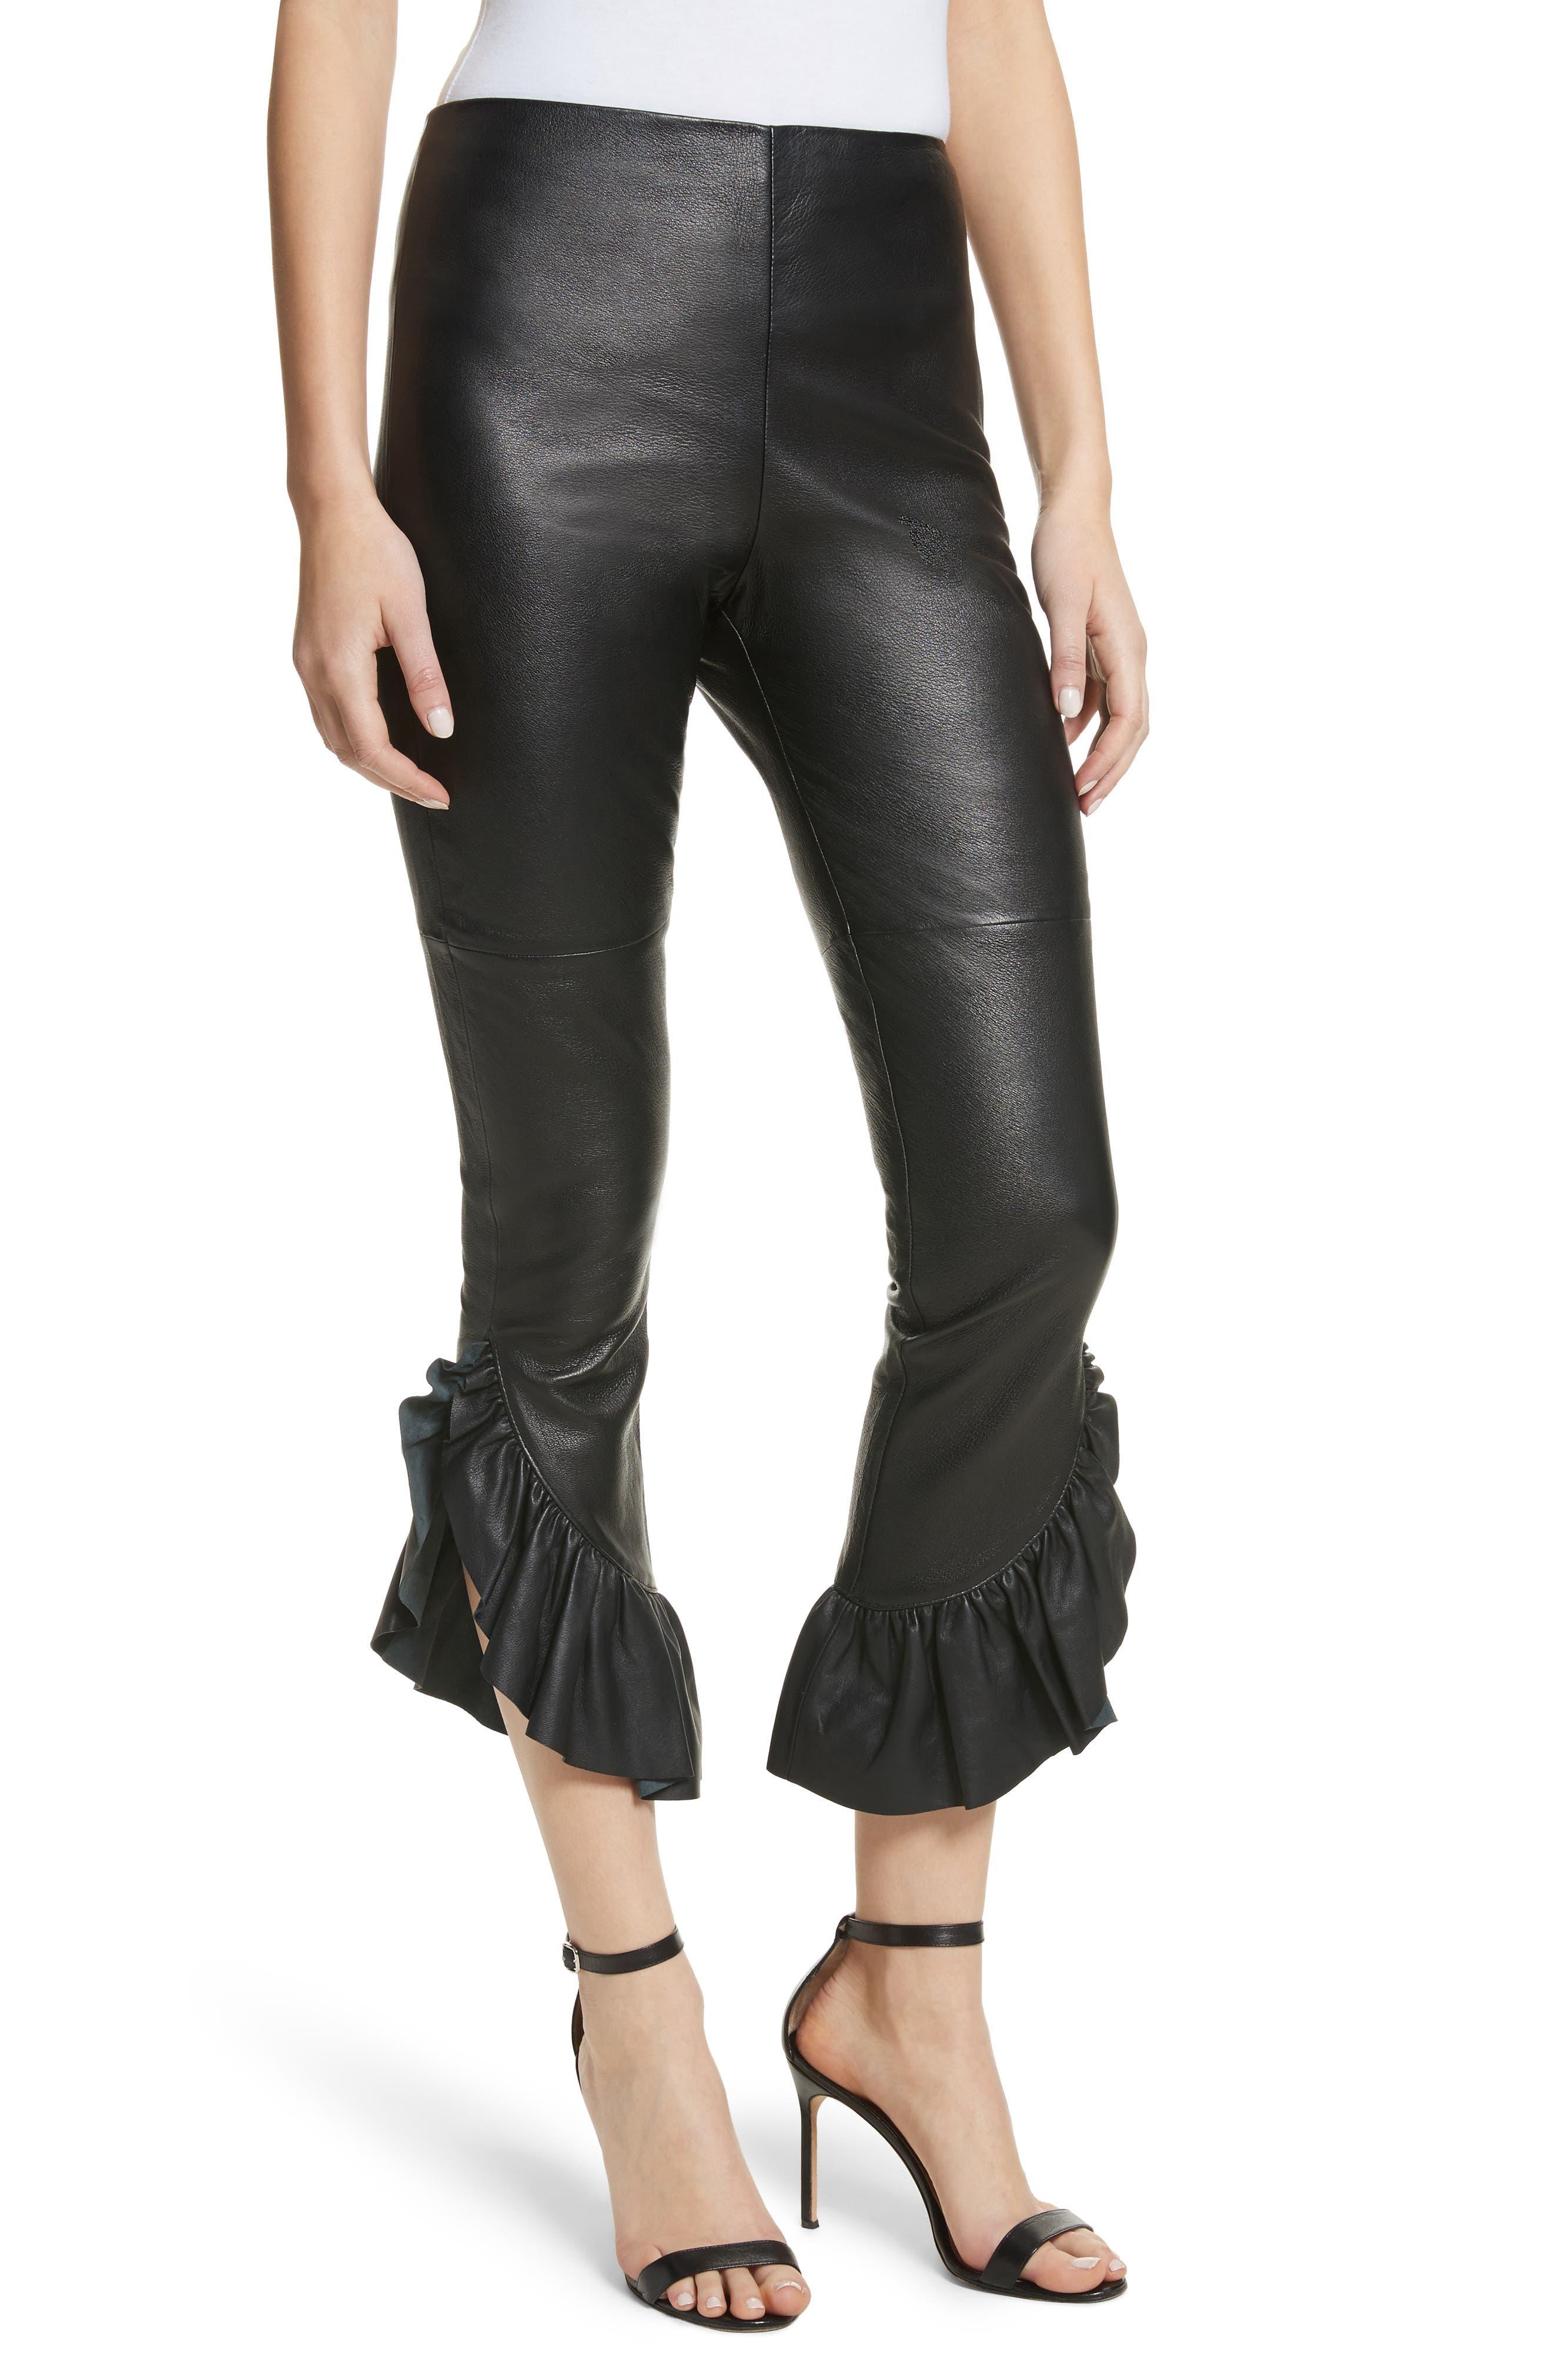 Gionata Ruffle Hem Leather Pants,                             Main thumbnail 1, color,                             Black